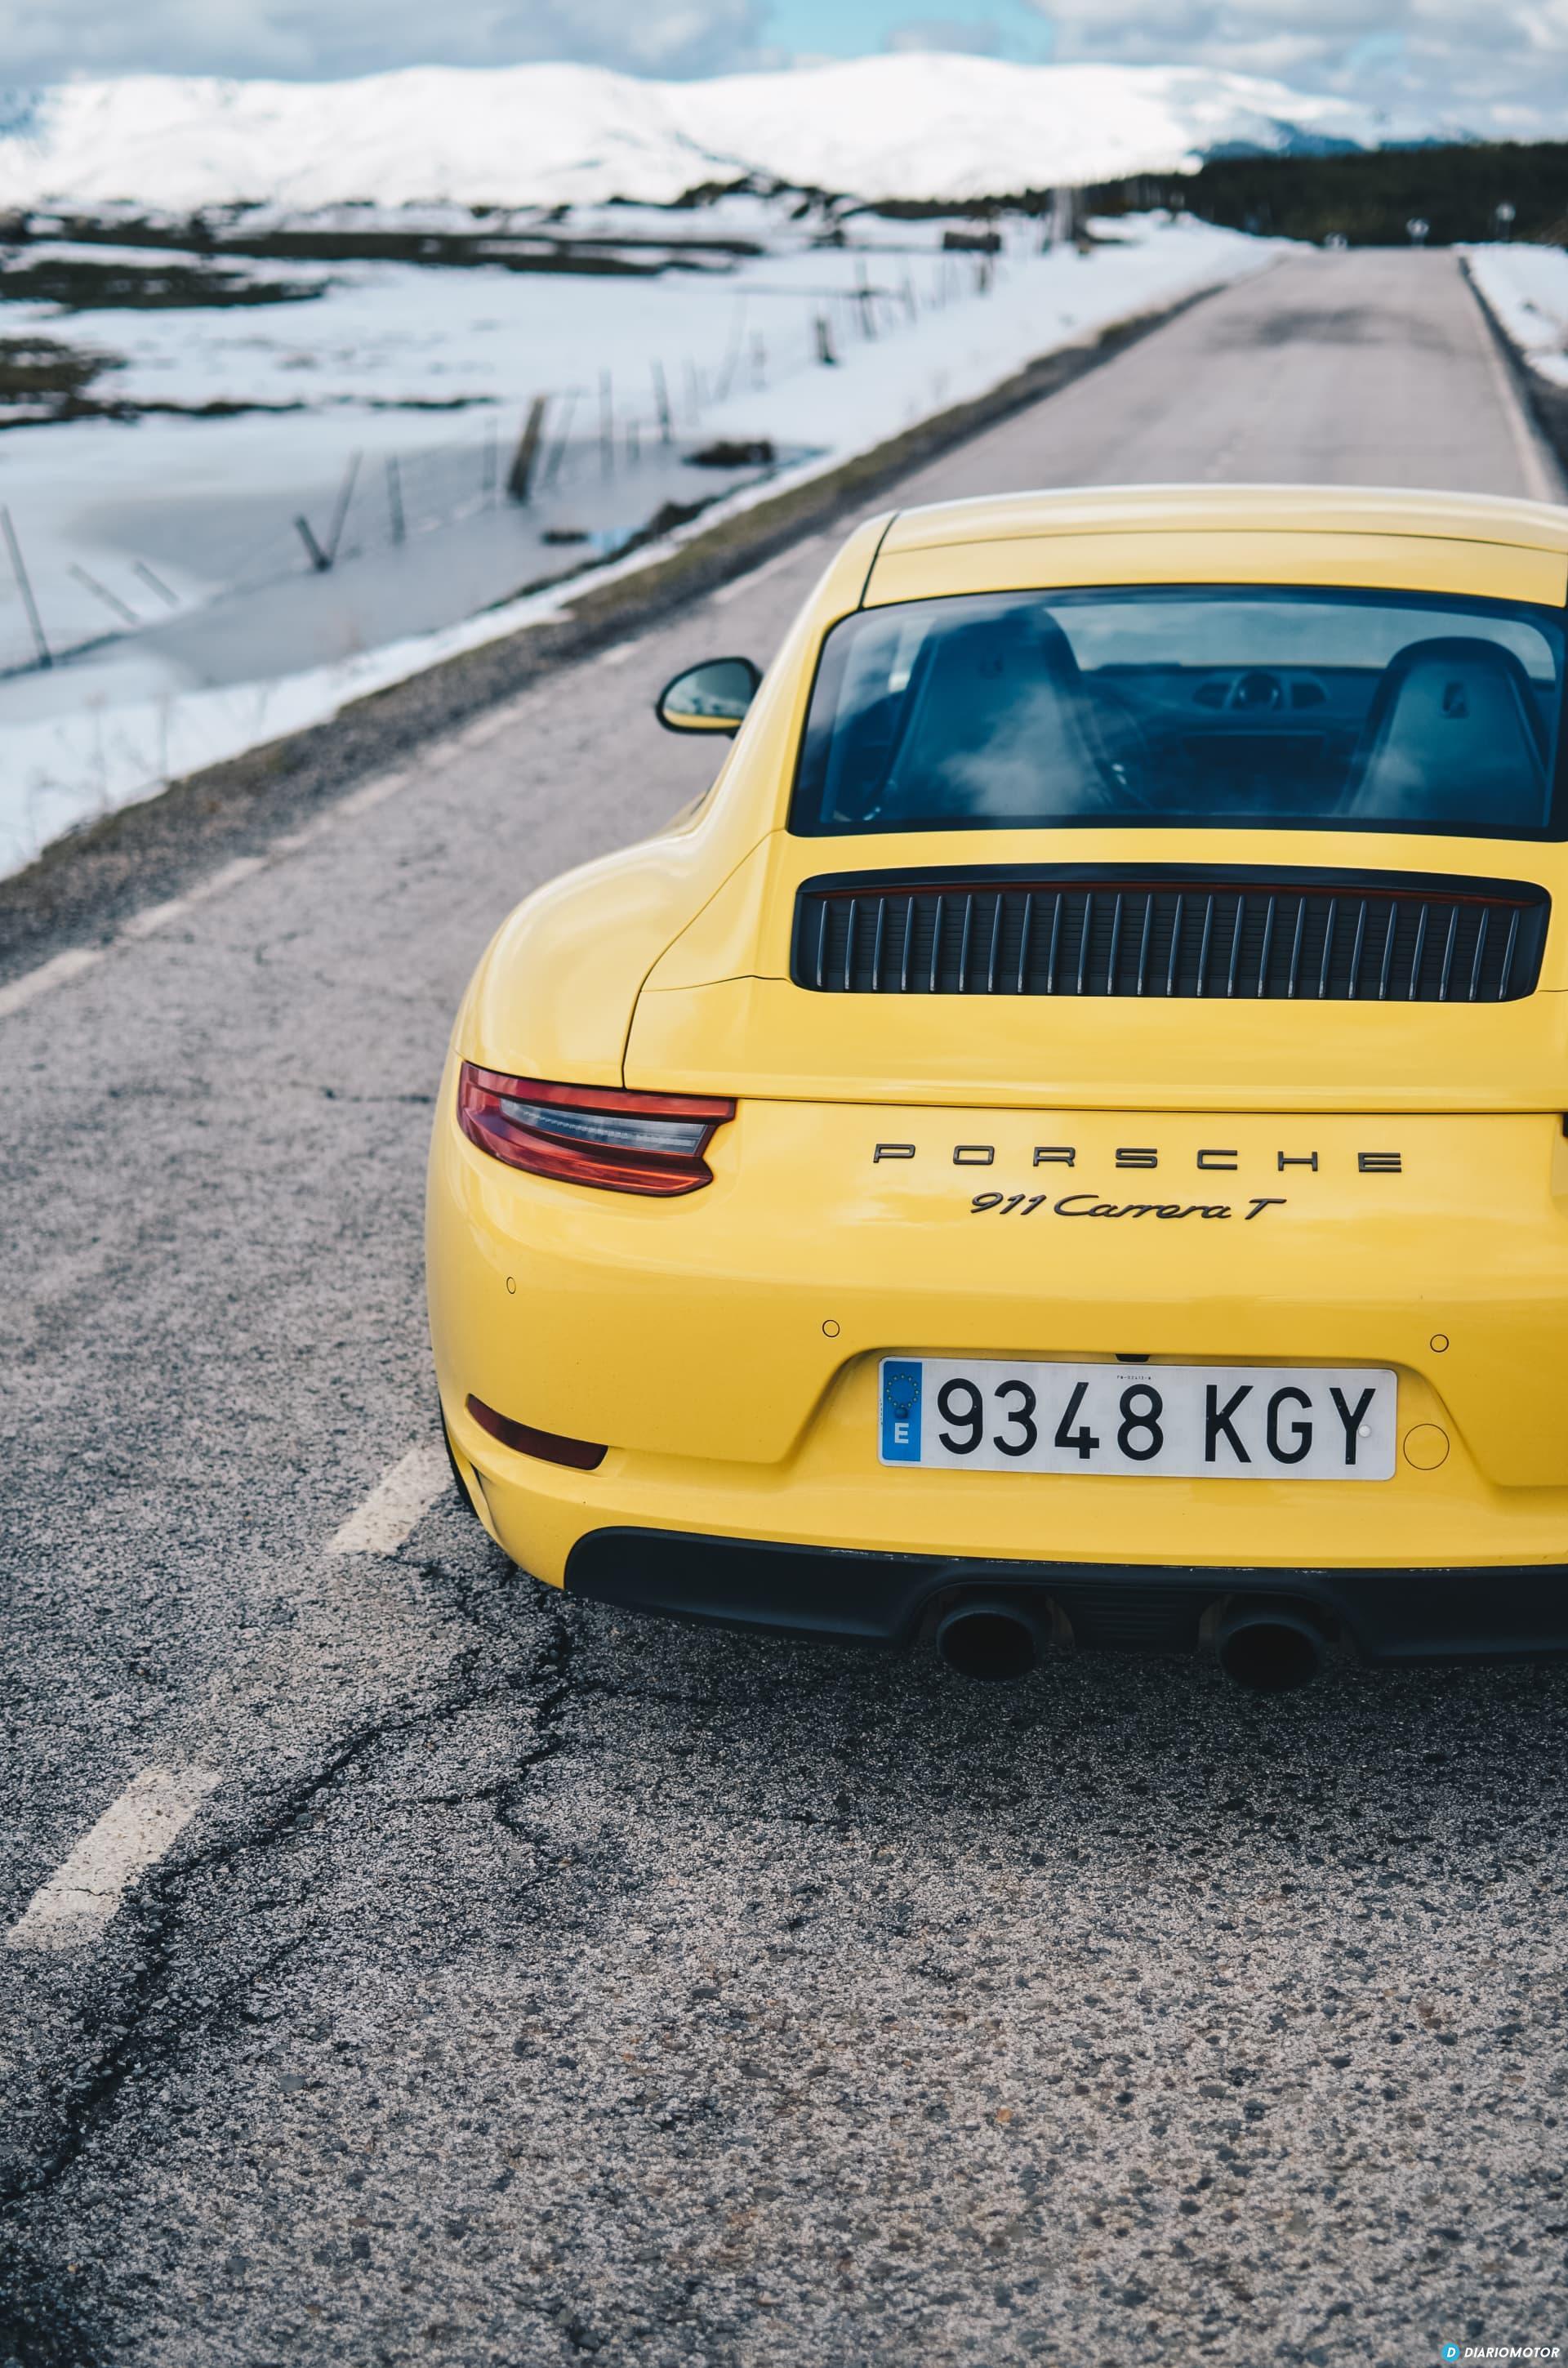 Porsche 911 Carrera 5 9